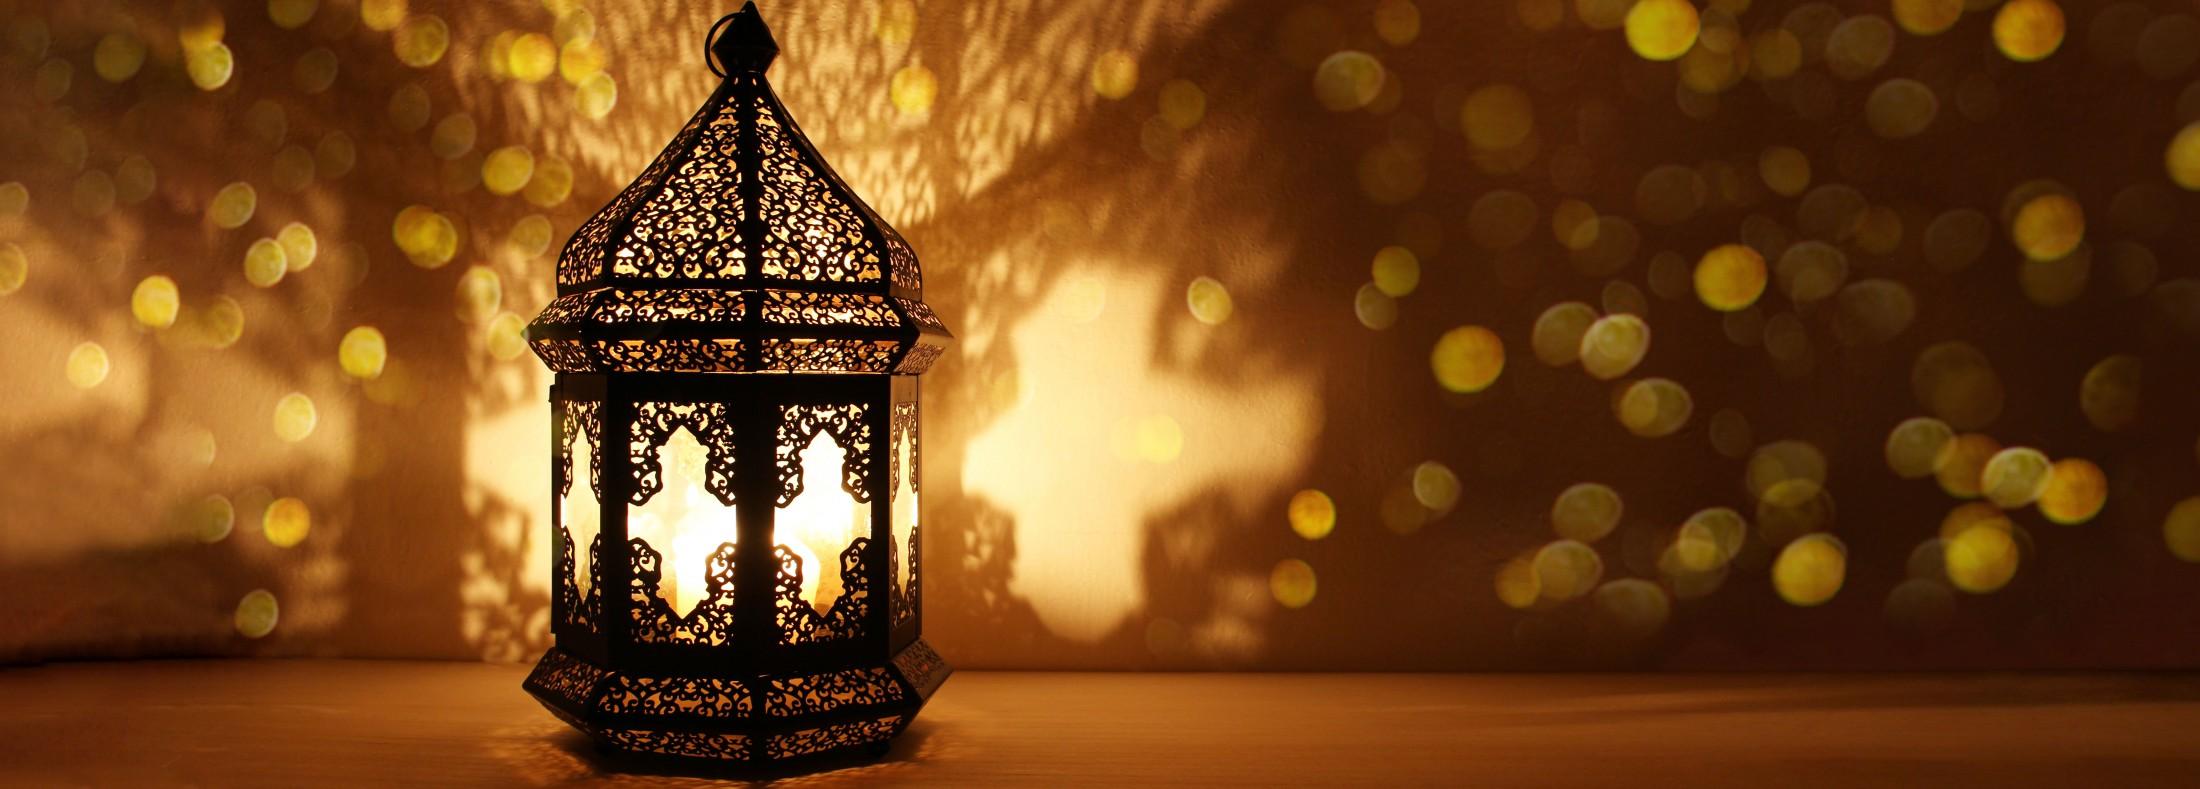 remarkable-ramadan-offer